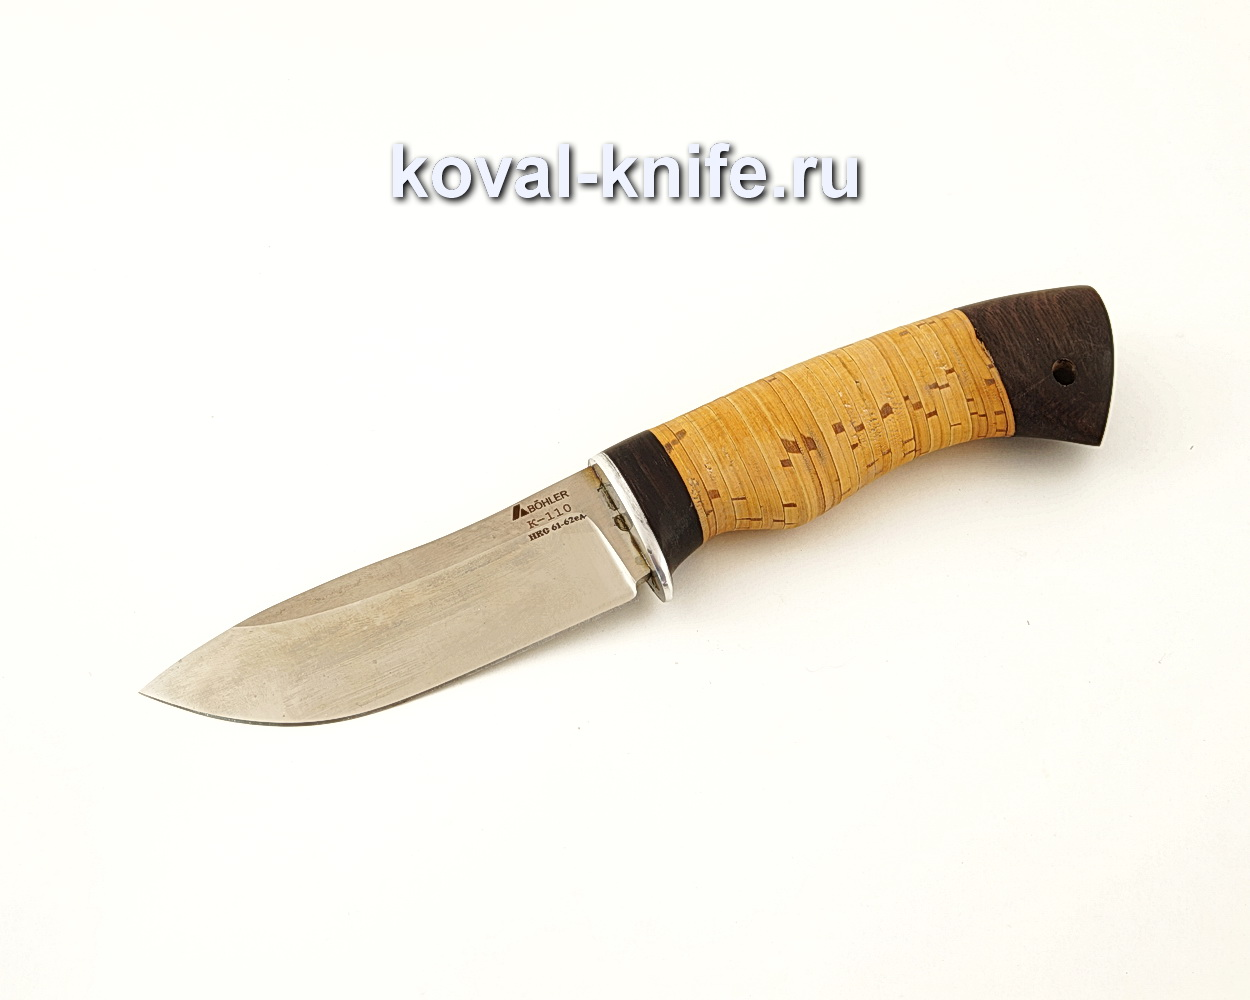 Нож Кабан из стали Bohler K110 с рукоятью из бересты  A628